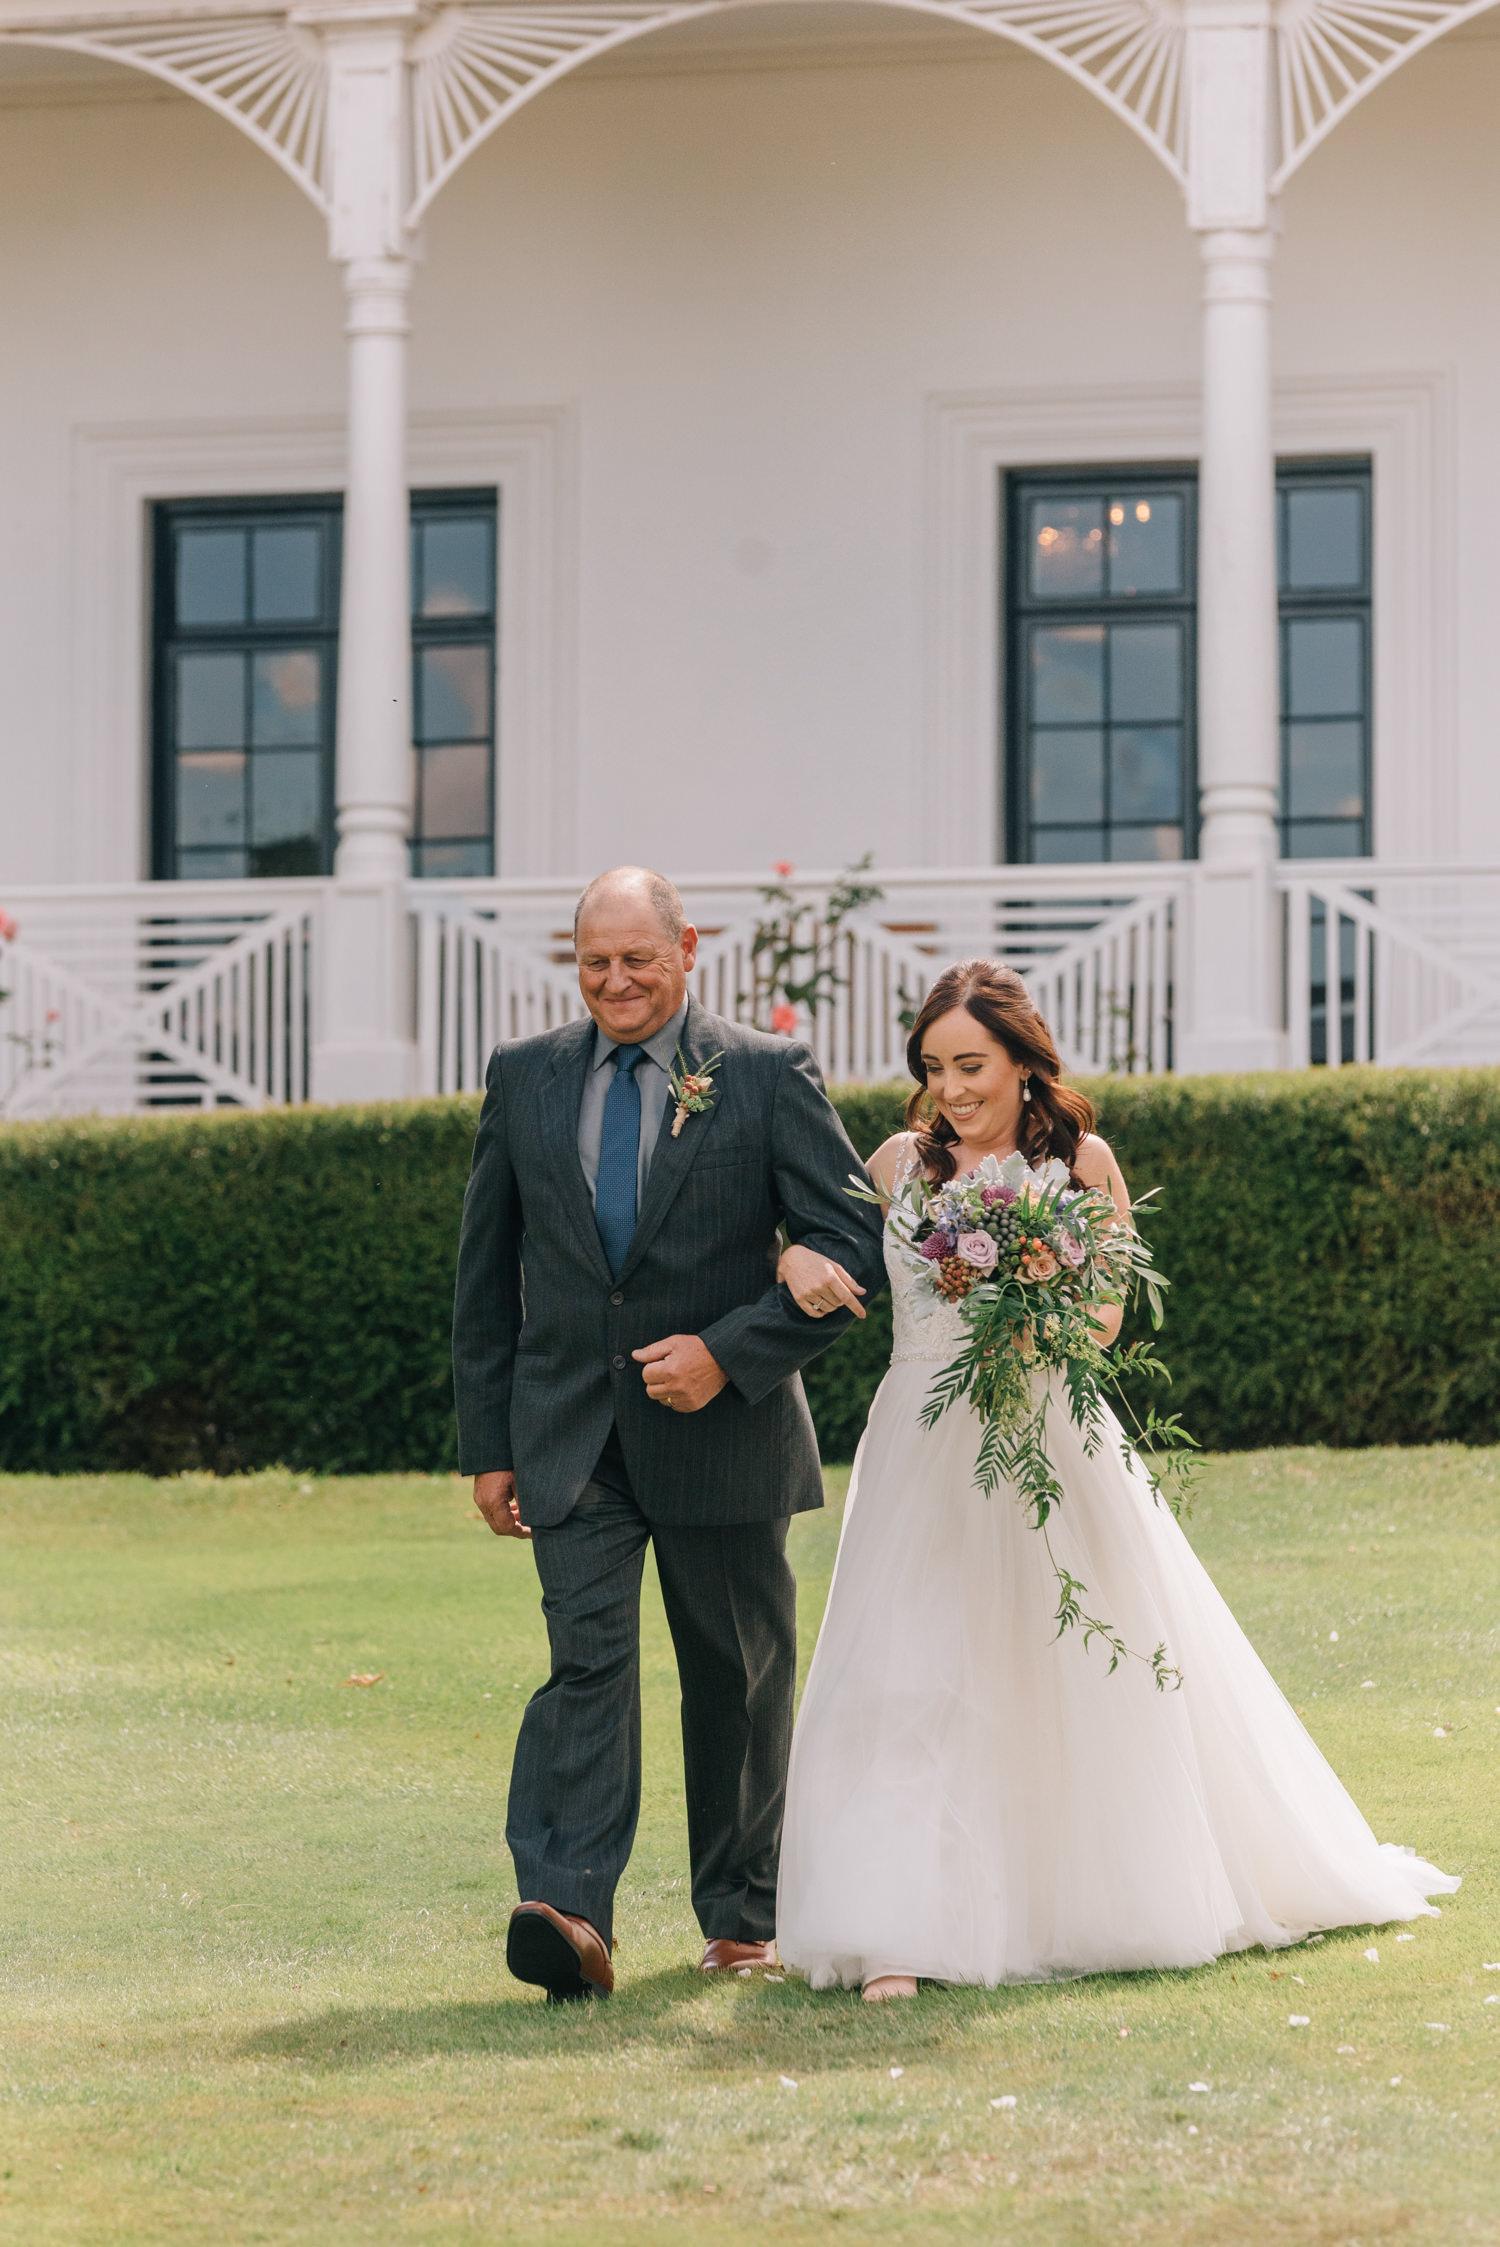 Quamby-Wedding-Photographer-64.jpg